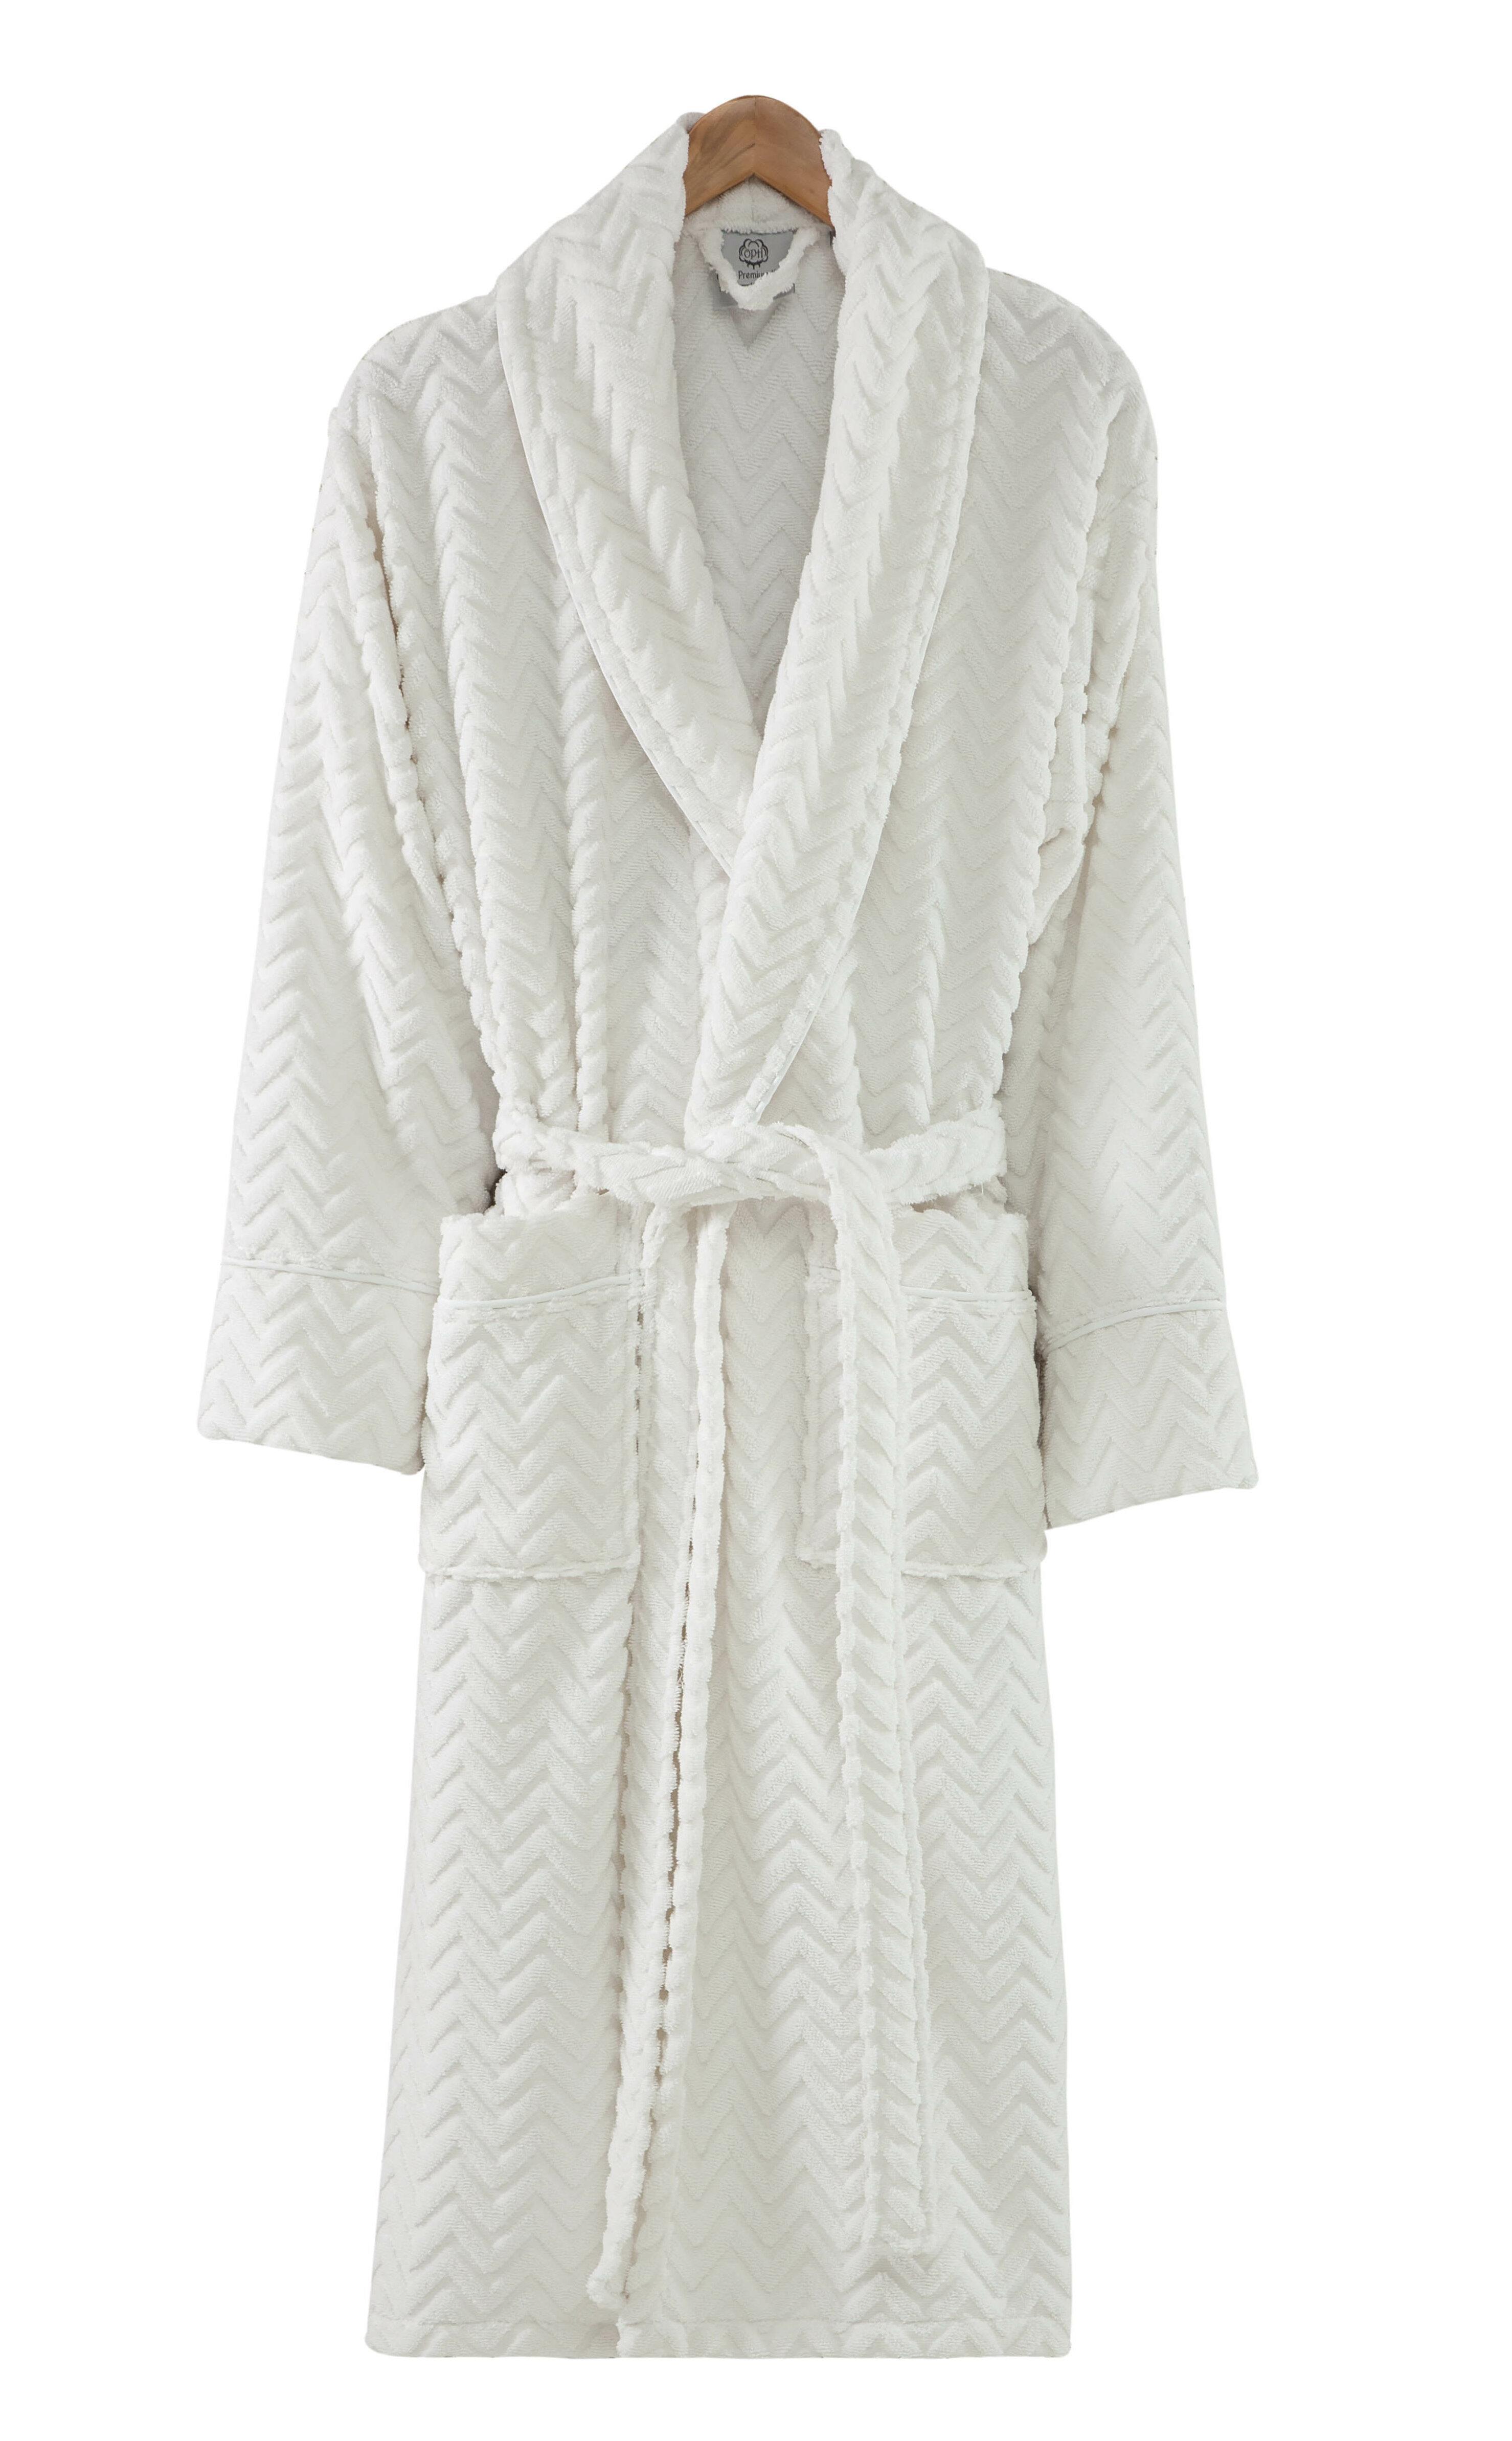 Symple Stuff 100 Turkish Cotton Terry Cloth Bathrobe Wayfair